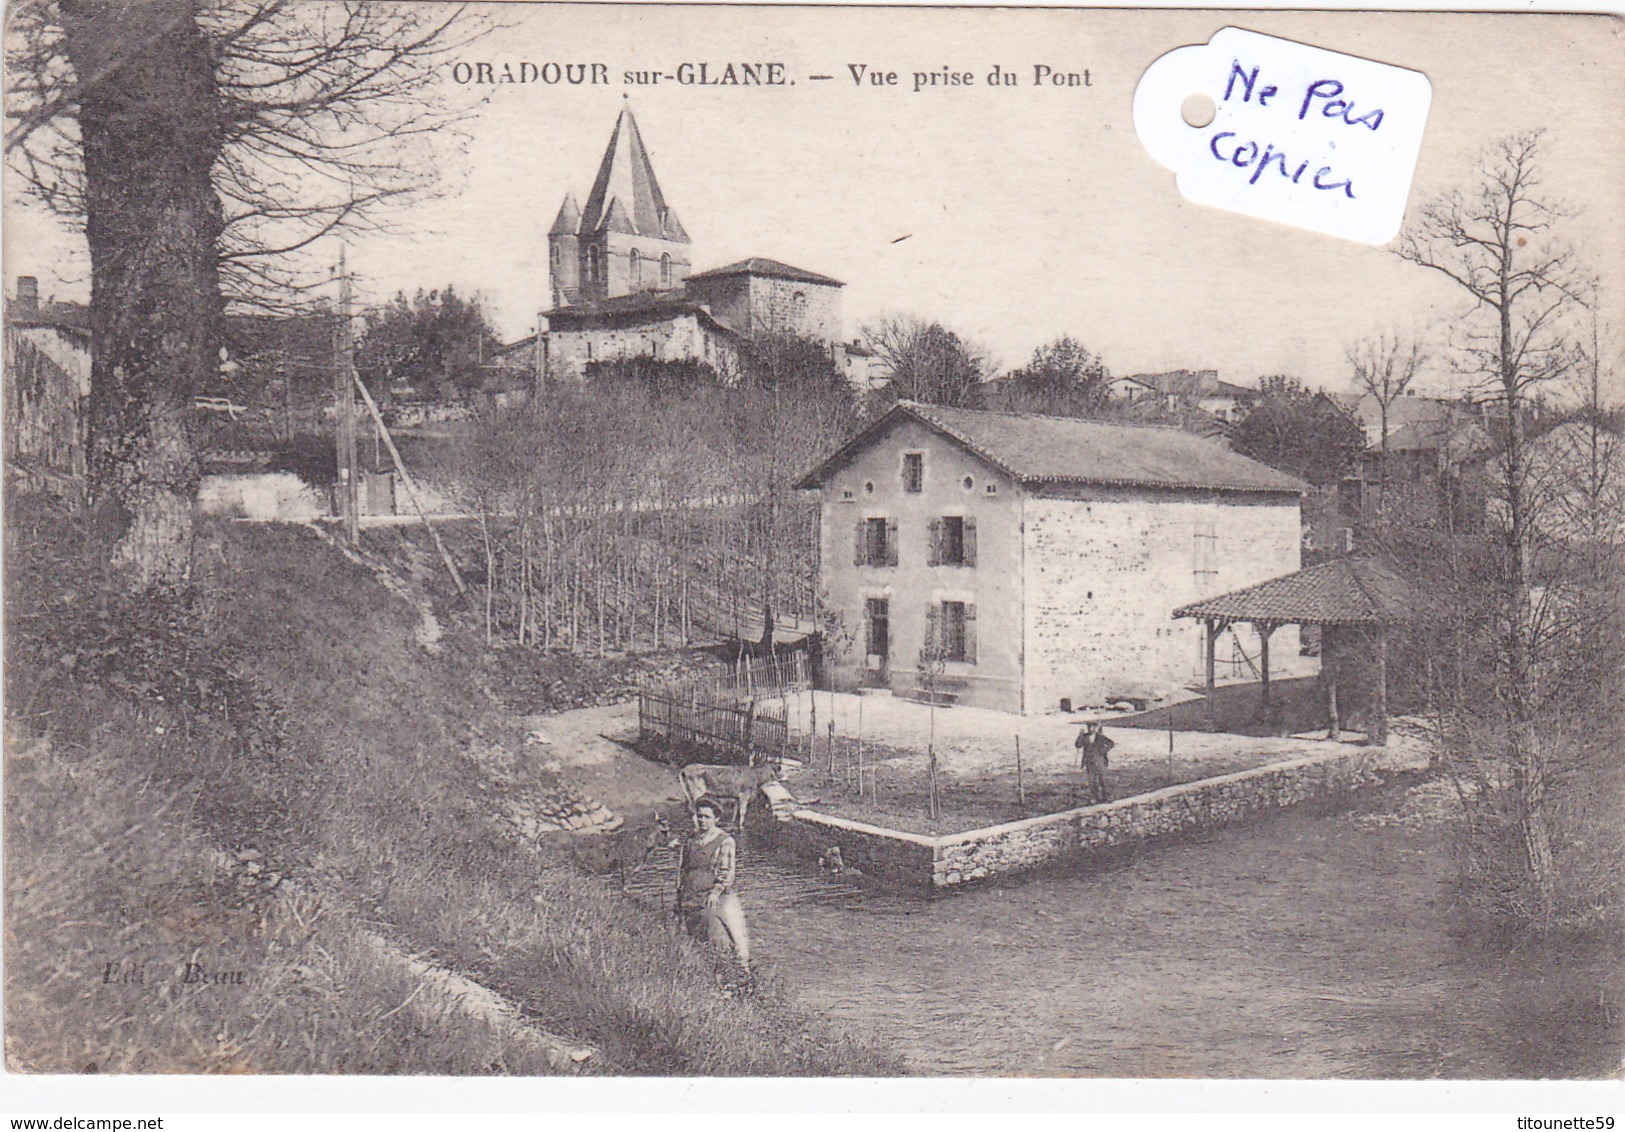 87-ORADOUR-sur-GLANE - Vue Du PONT - Oradour Sur Glane